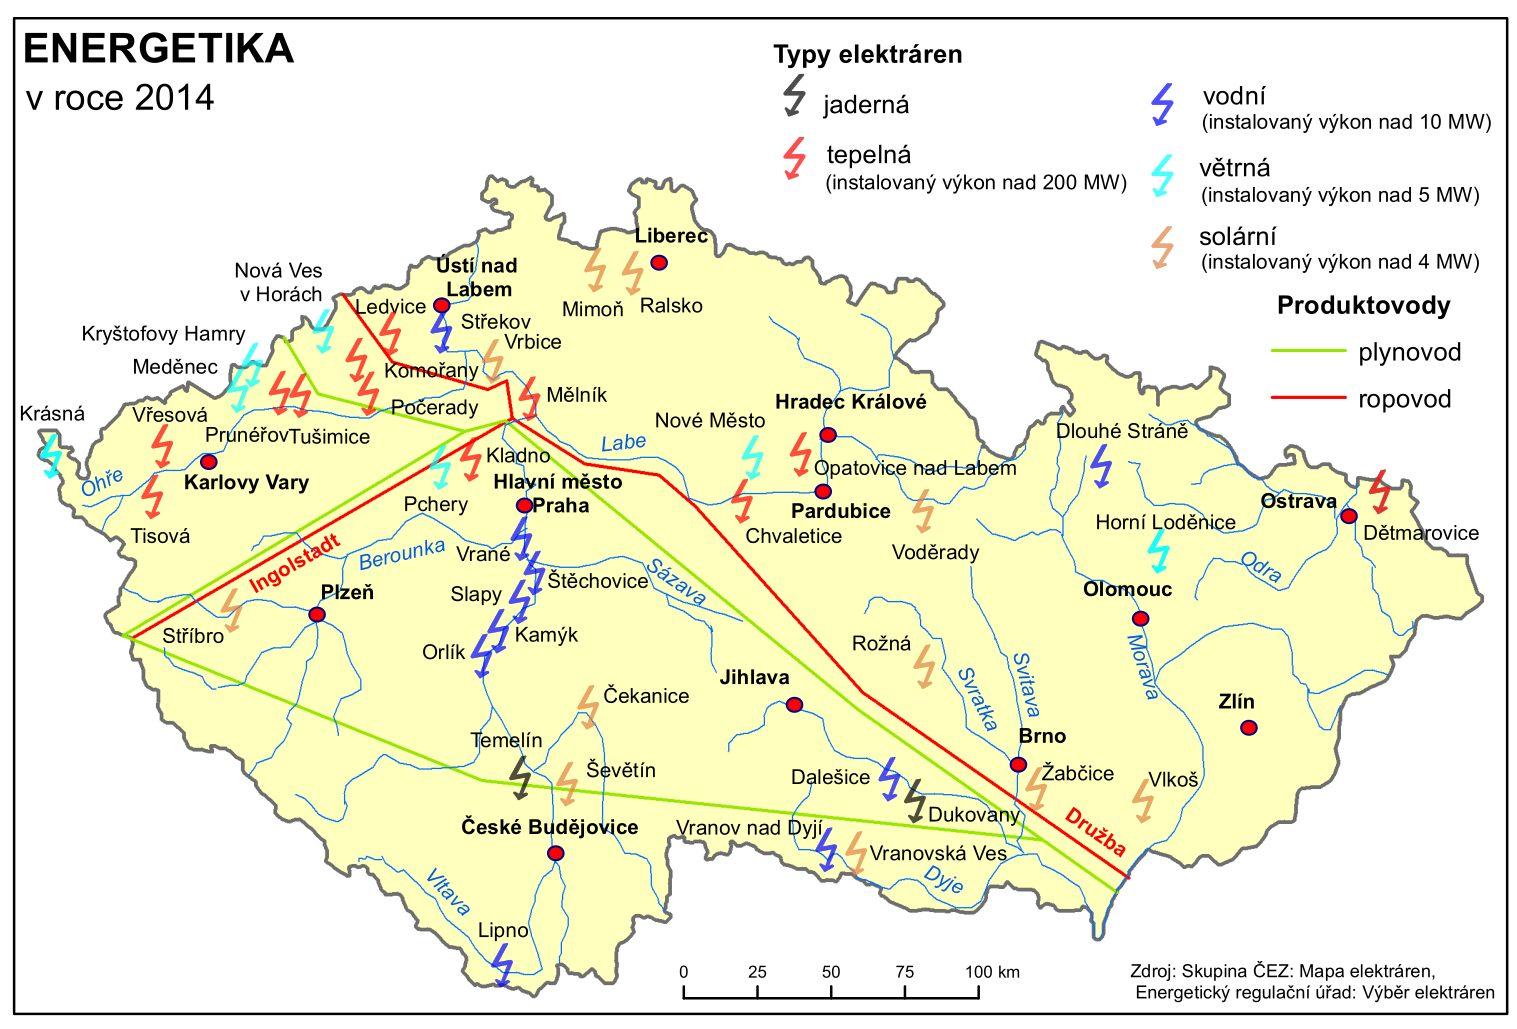 Energetika Ceska Republika Tematicky Atlas Pedagogicka